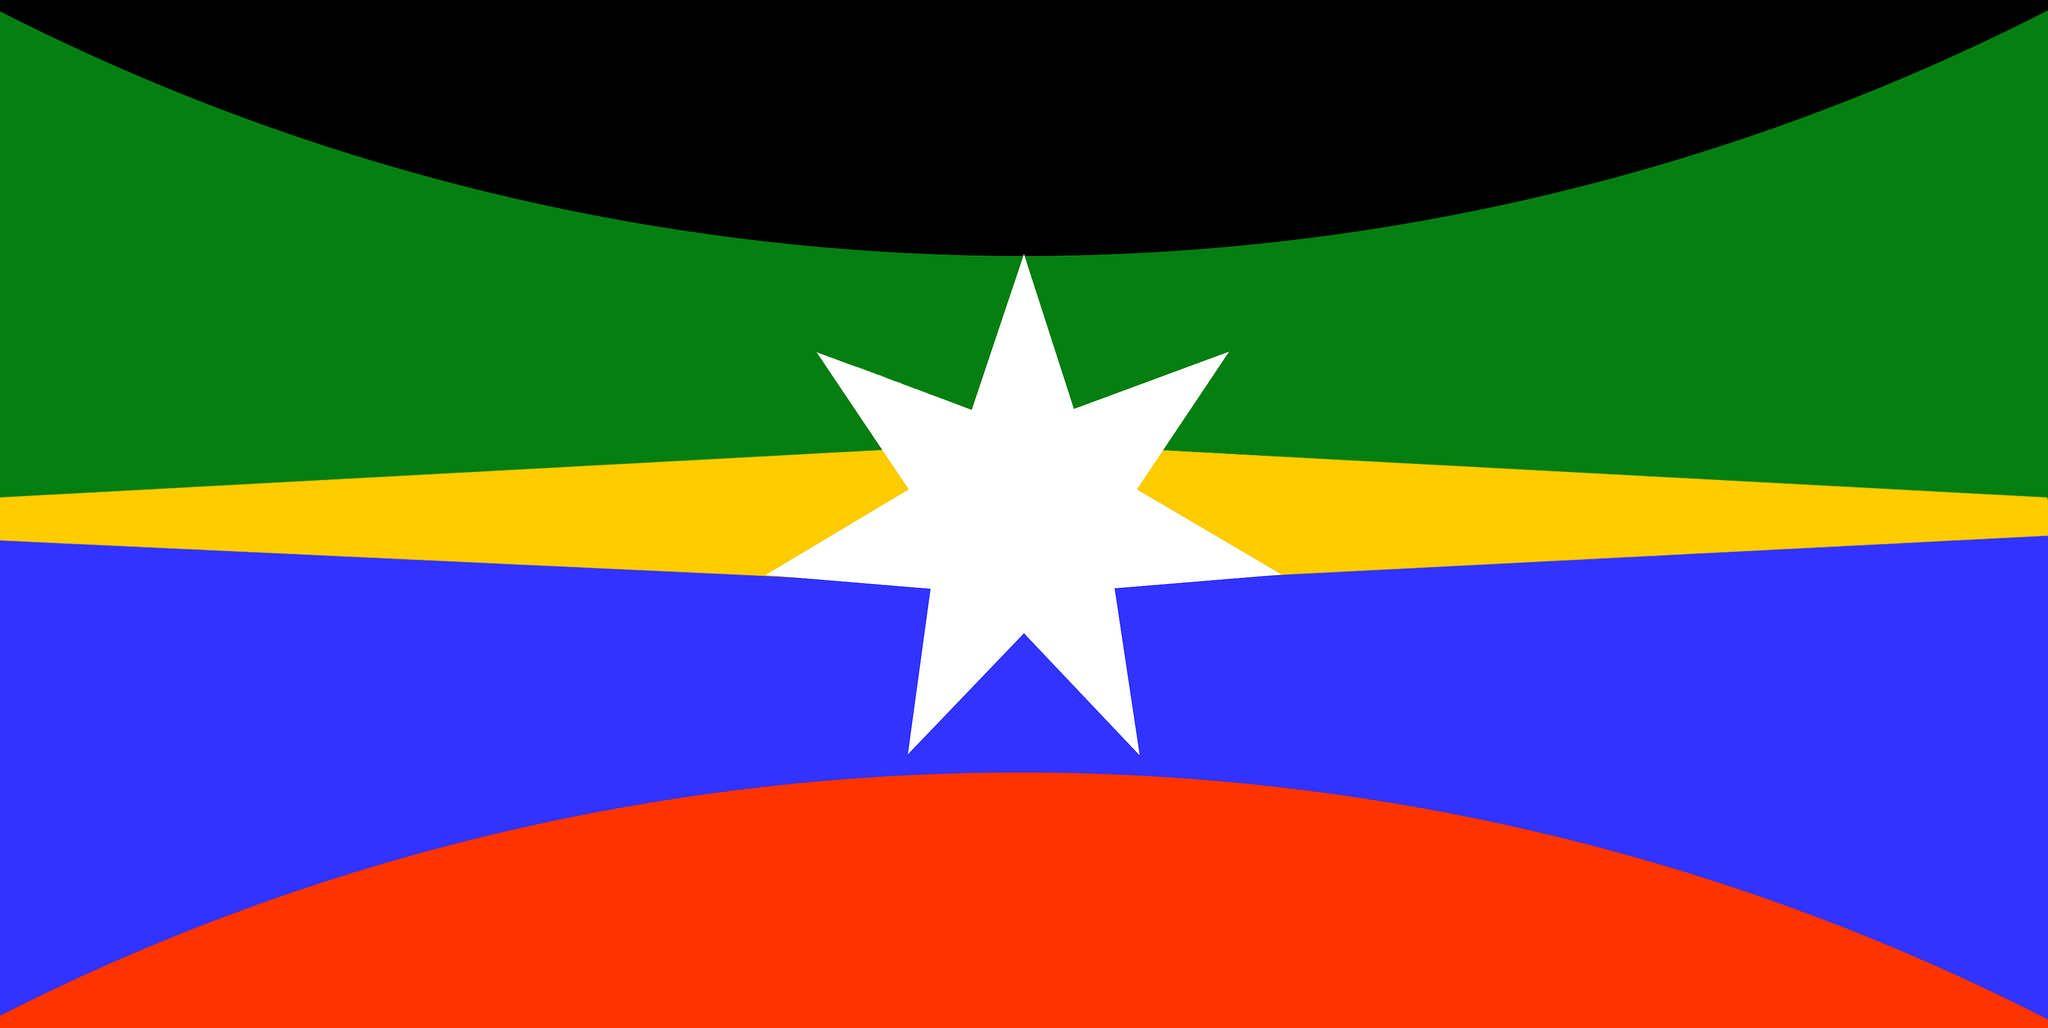 Https Flic Kr P Su1hse Ulurusky D7lmax Australis Gb Ulurusky Terraustralis D7lmax Green Blue Design Revision For A Ne Australian Flags Eureka Flag Flag